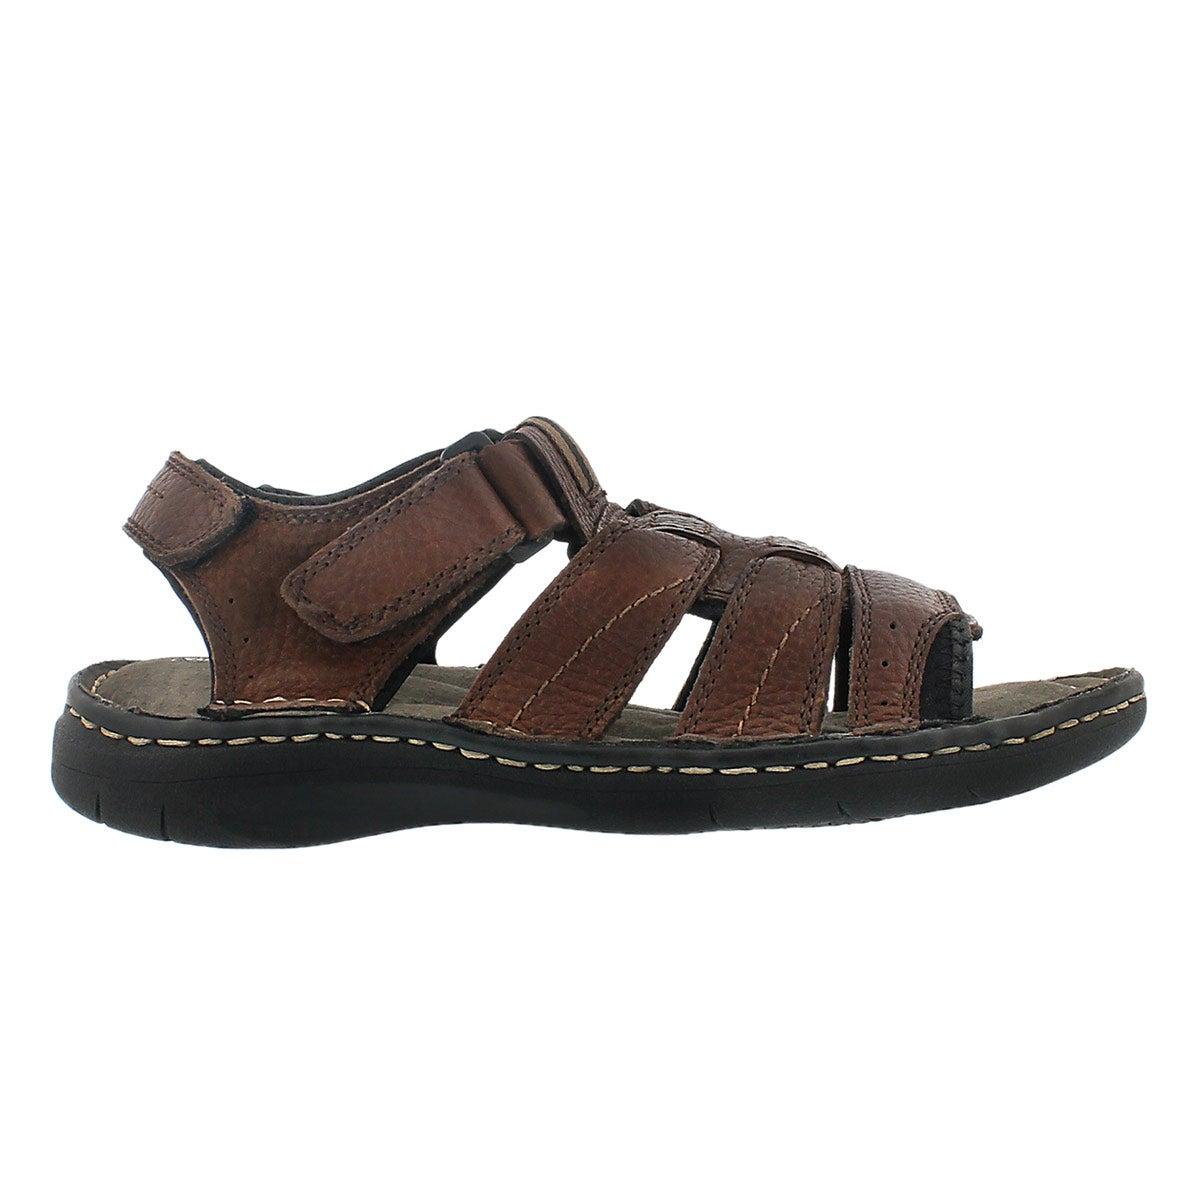 Mns Colin 3 brn opentoe fishermn sandal